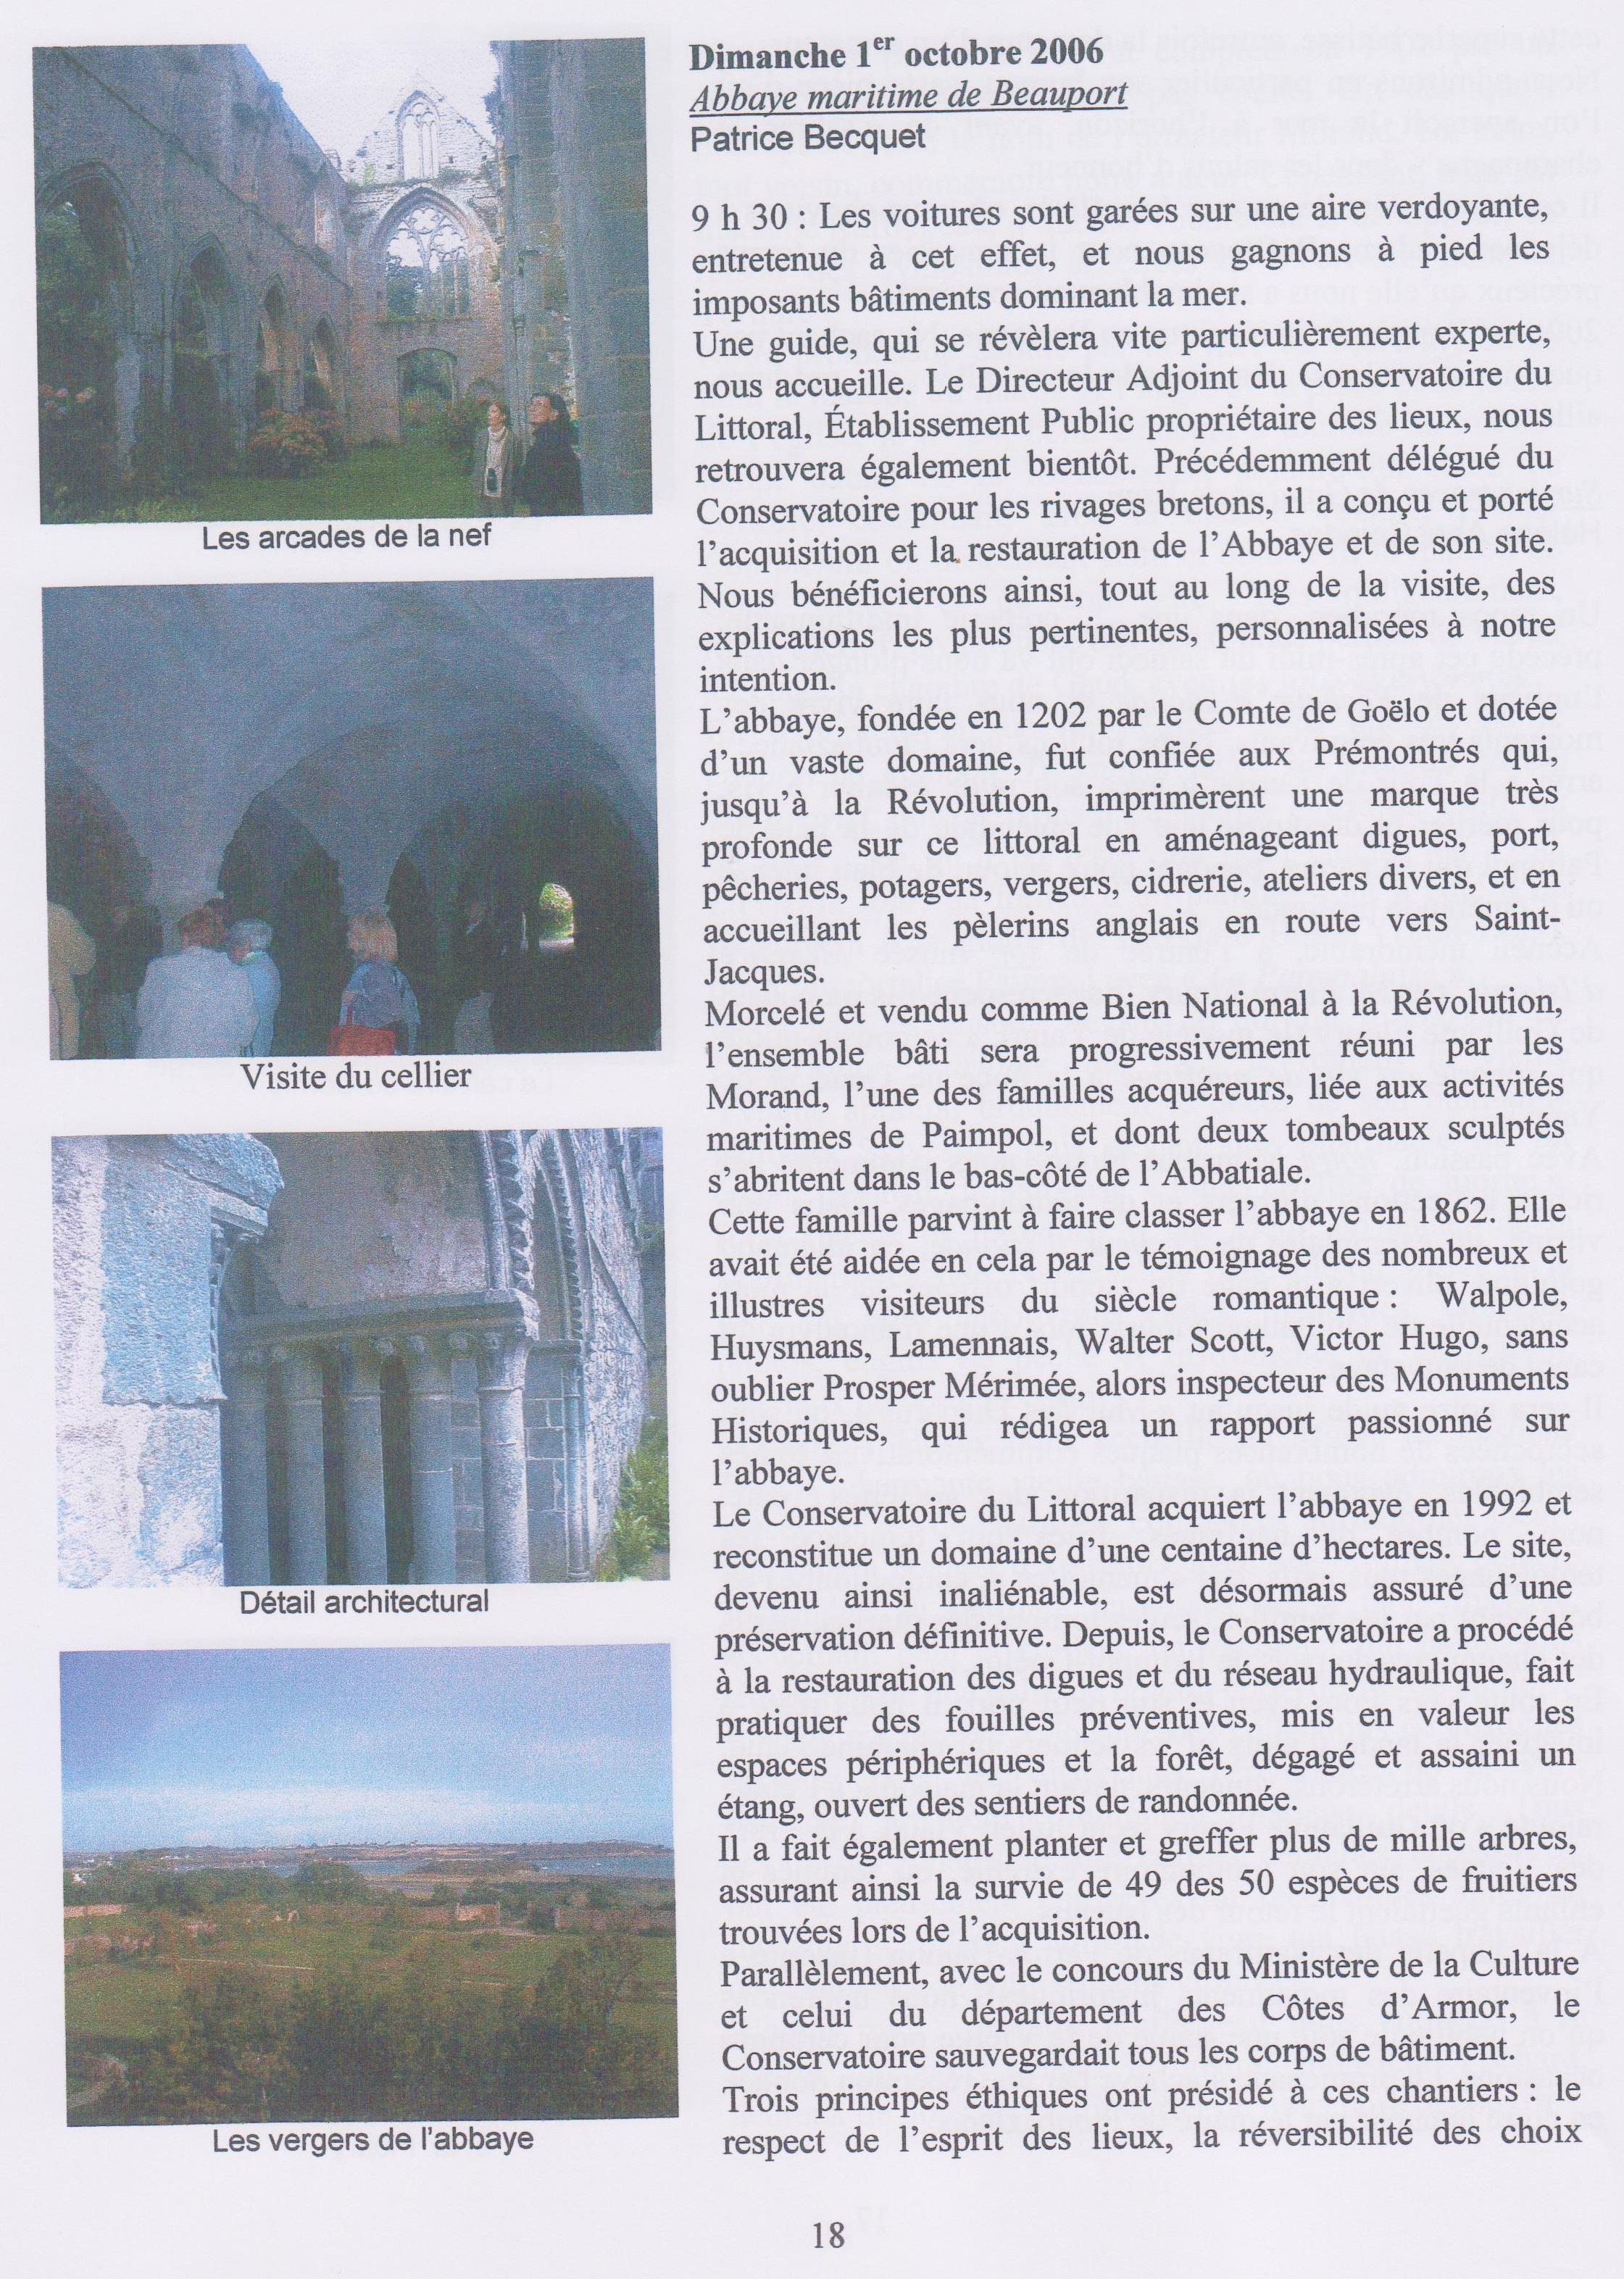 Voyage Paimpol 2006-page 18